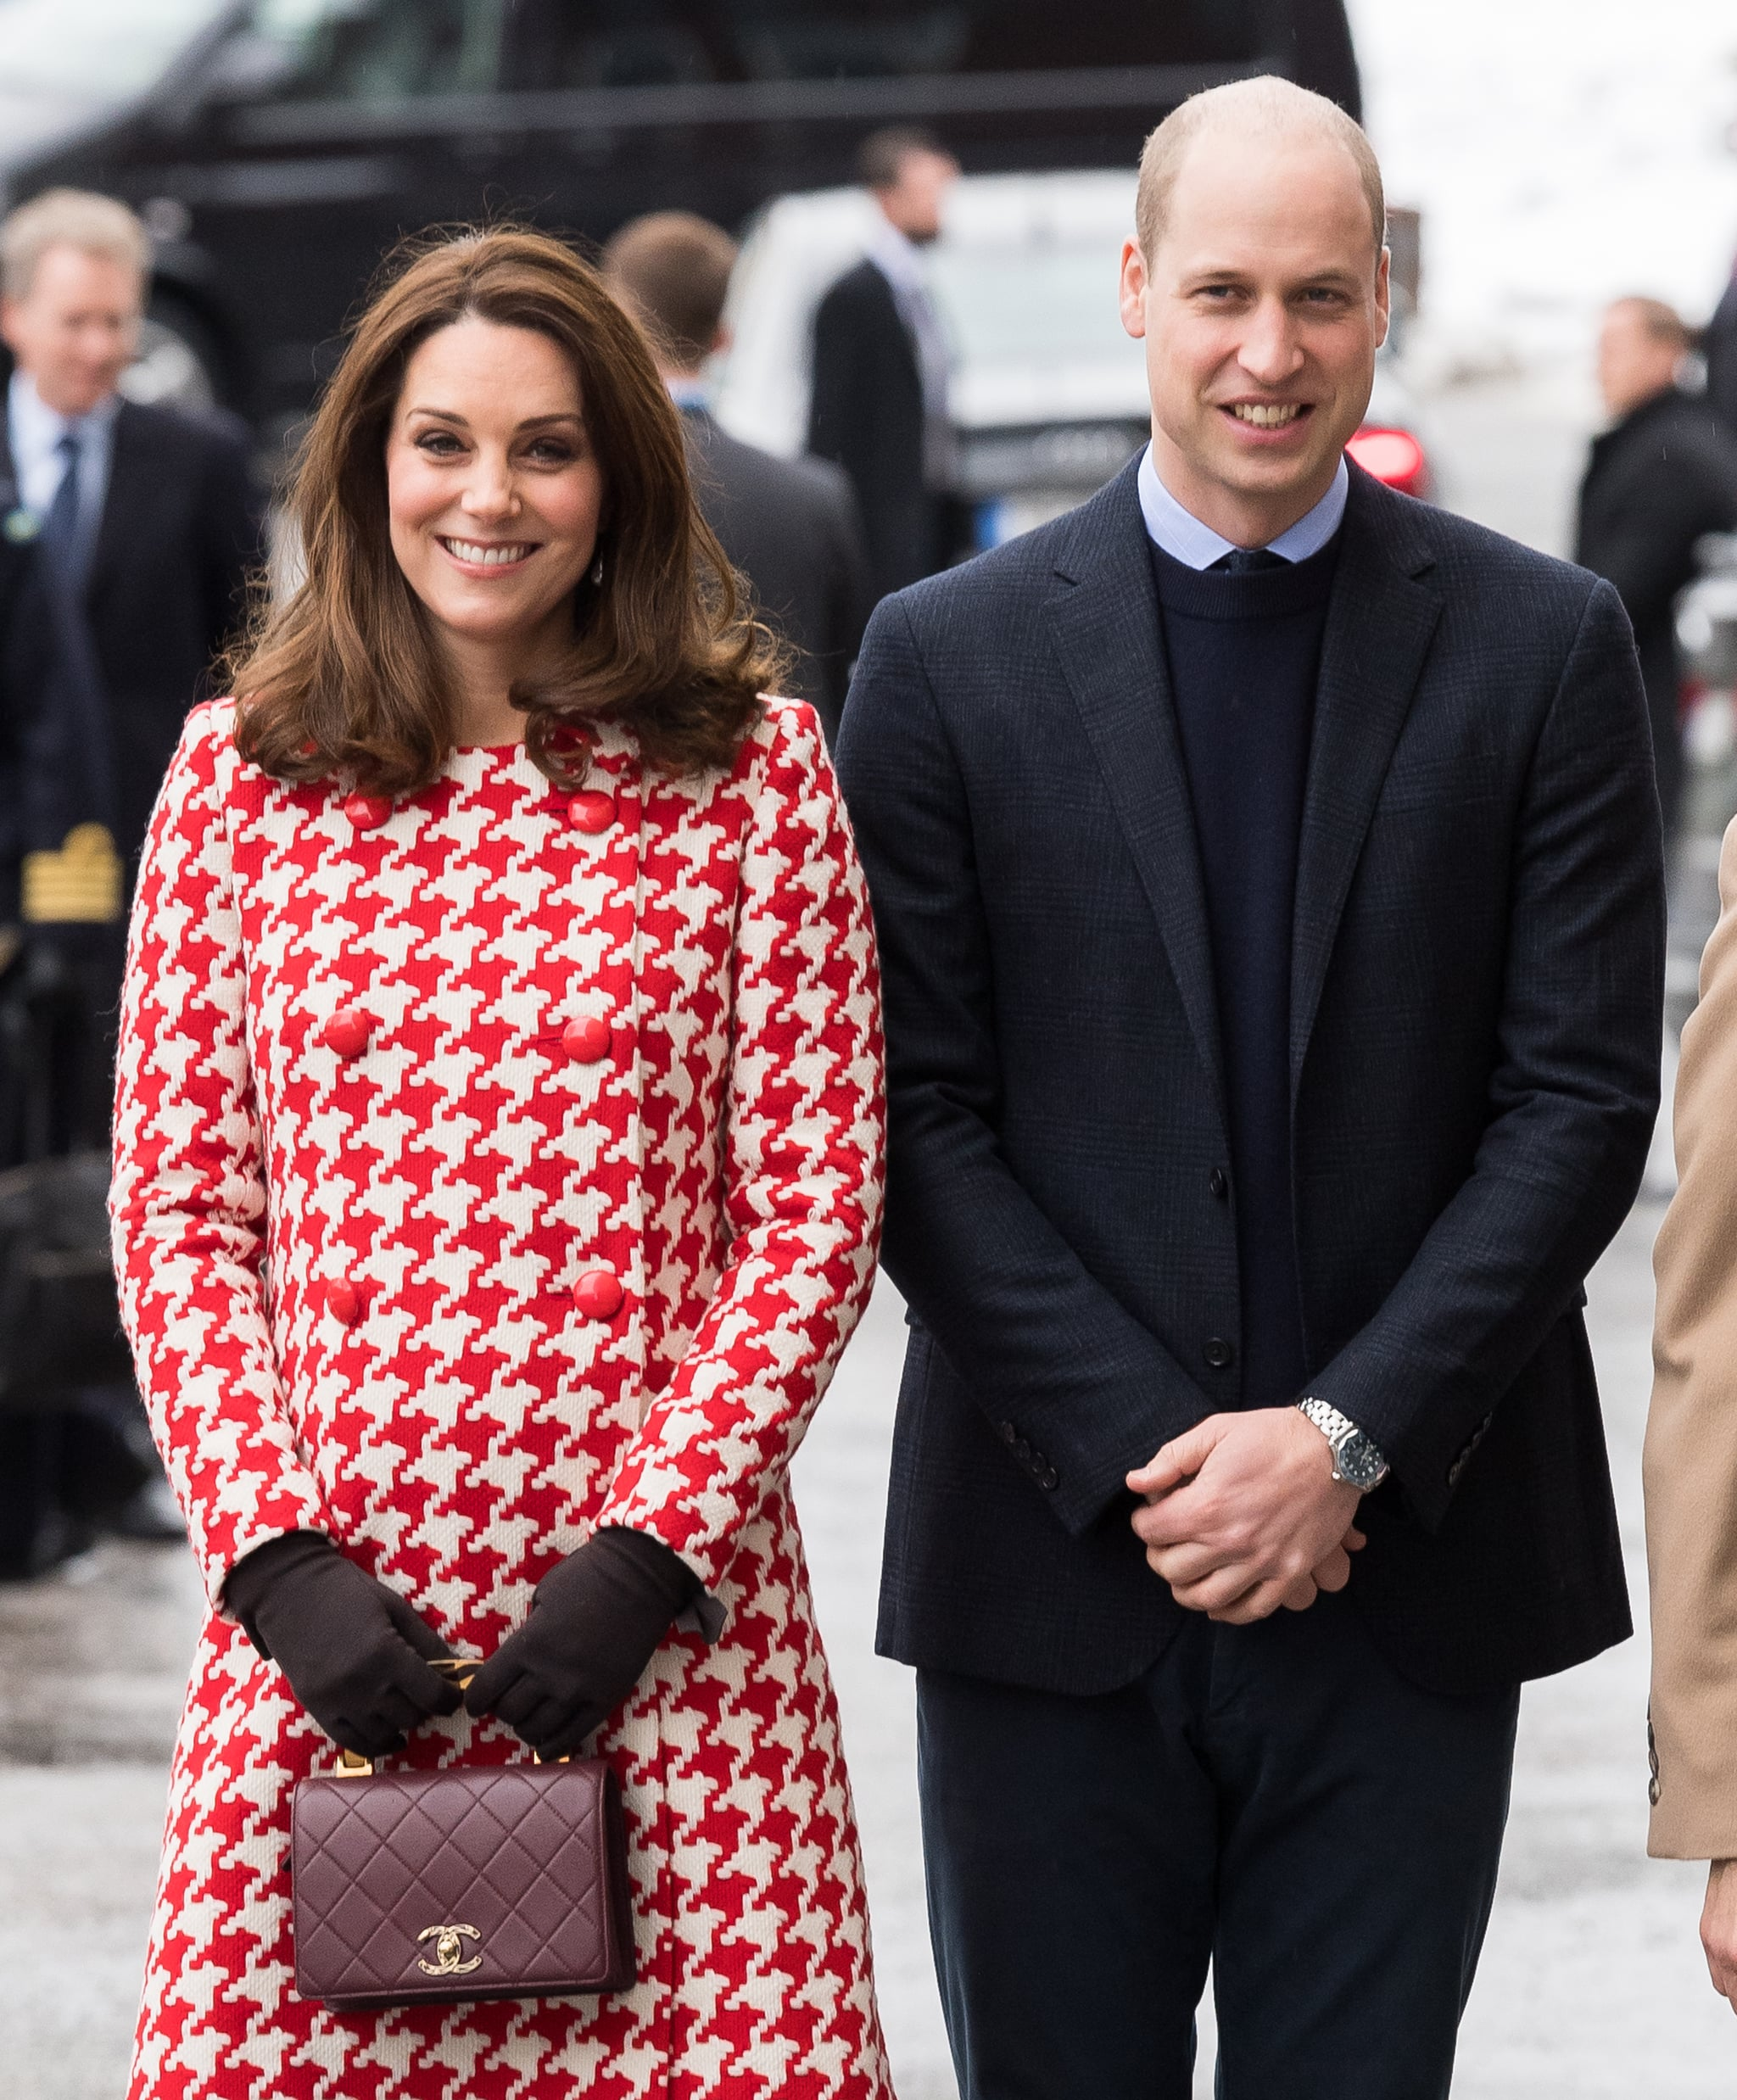 Kate Middleton Gives Birth to Third Child | POPSUGAR Celebrity UK